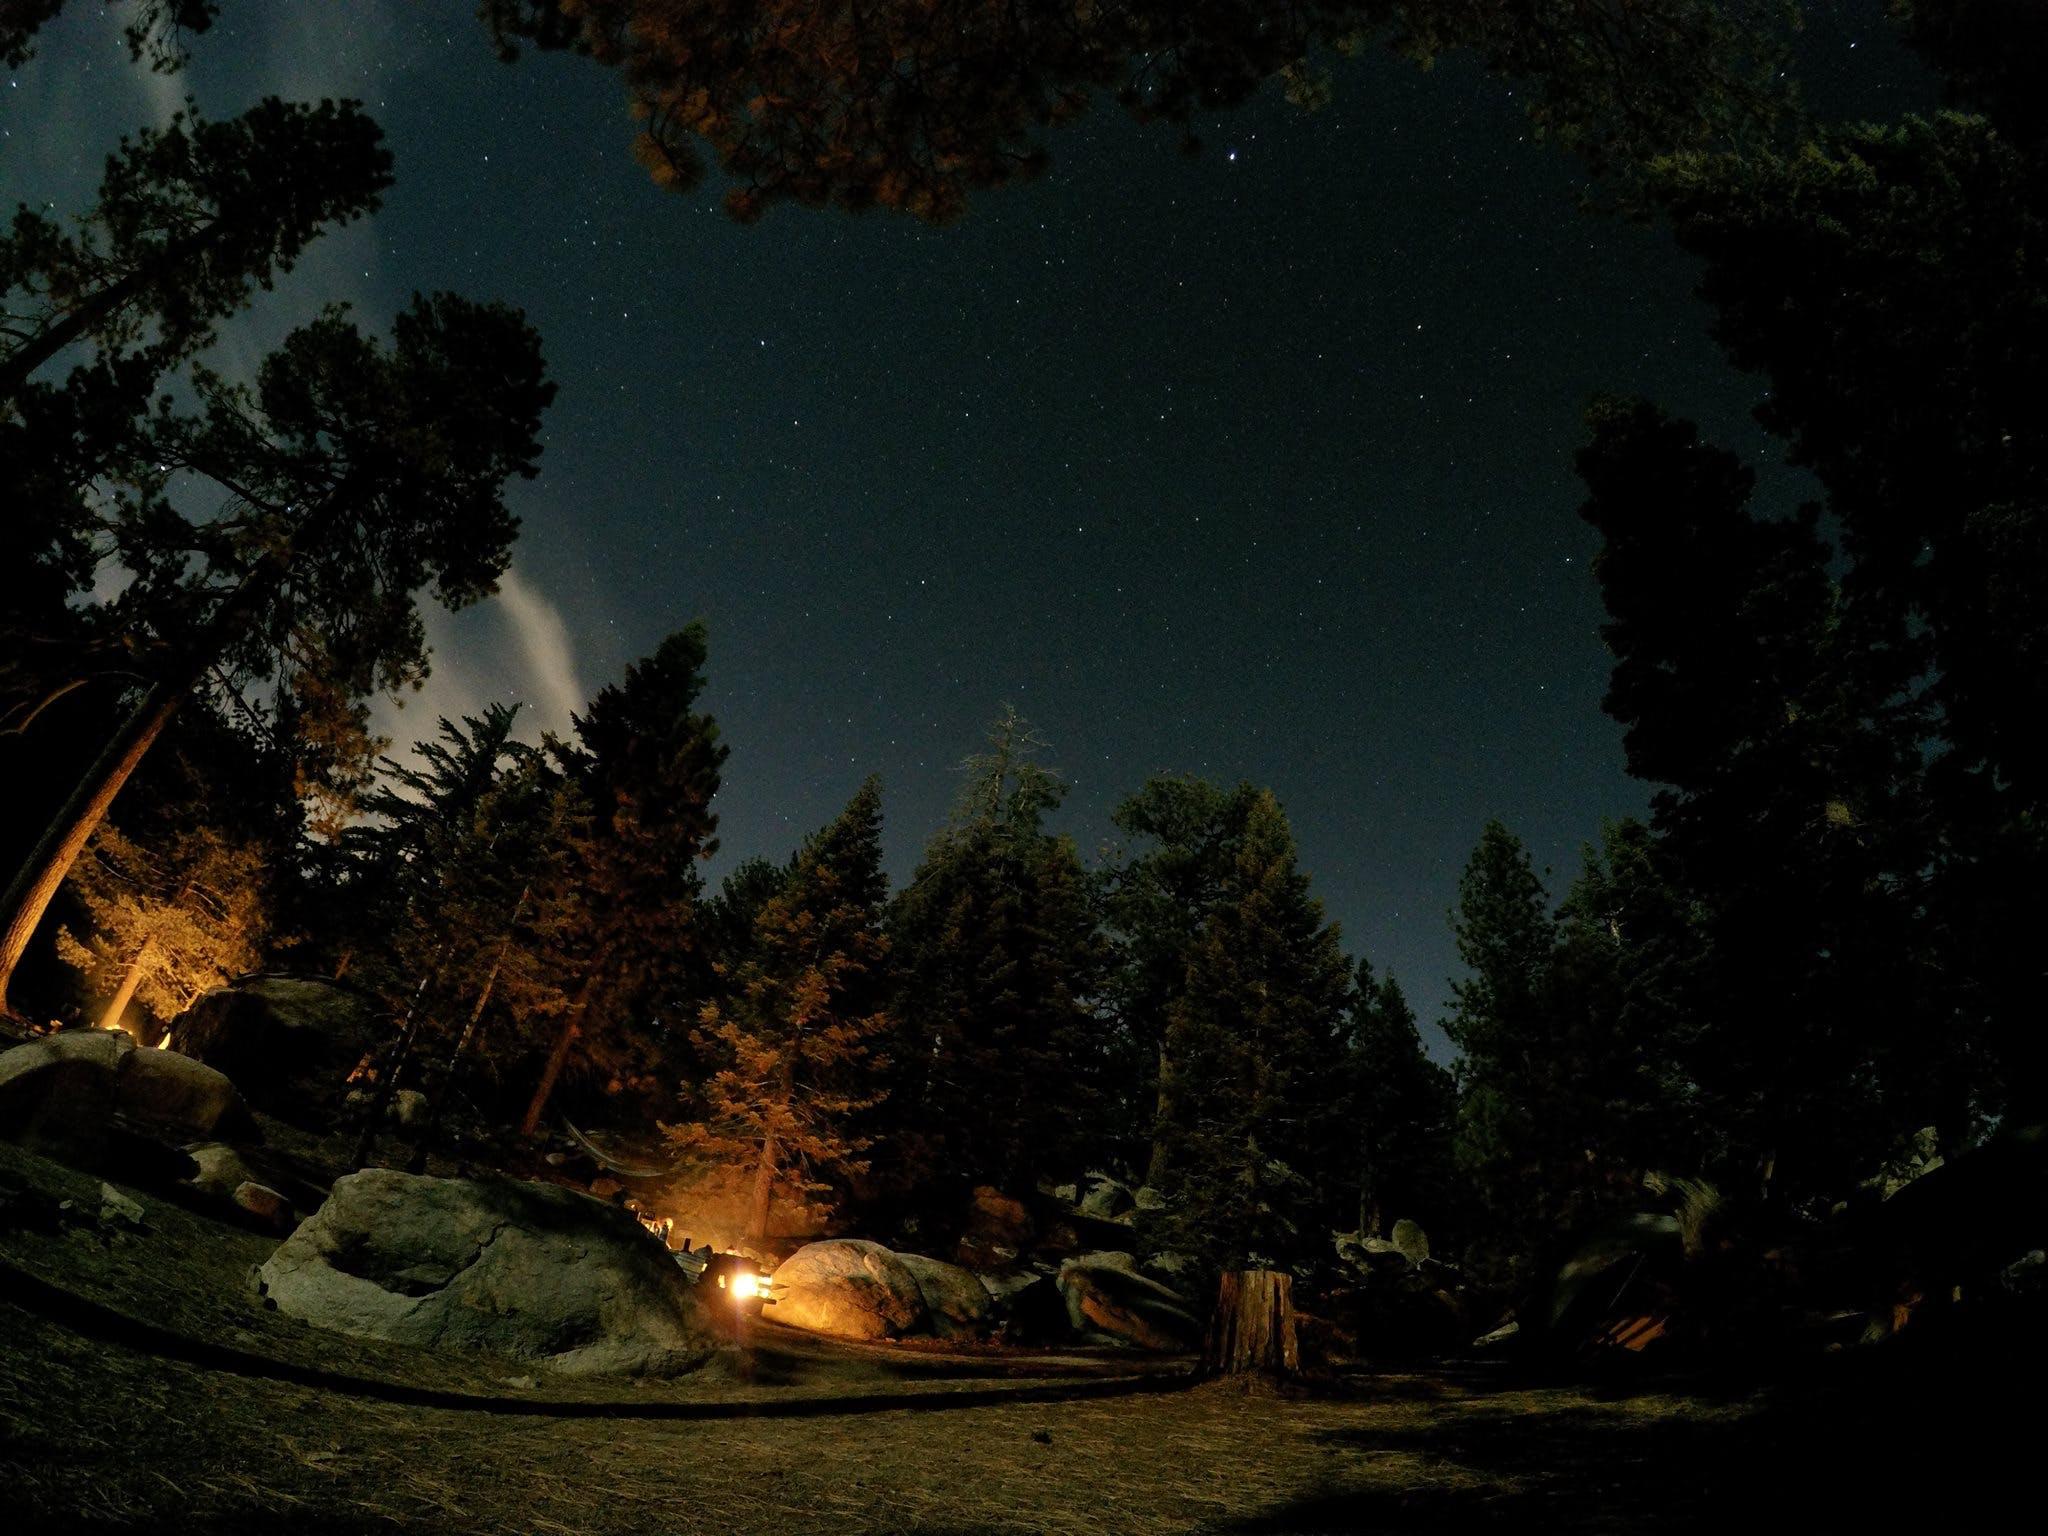 Boulder Basin, CA | The Dyrt